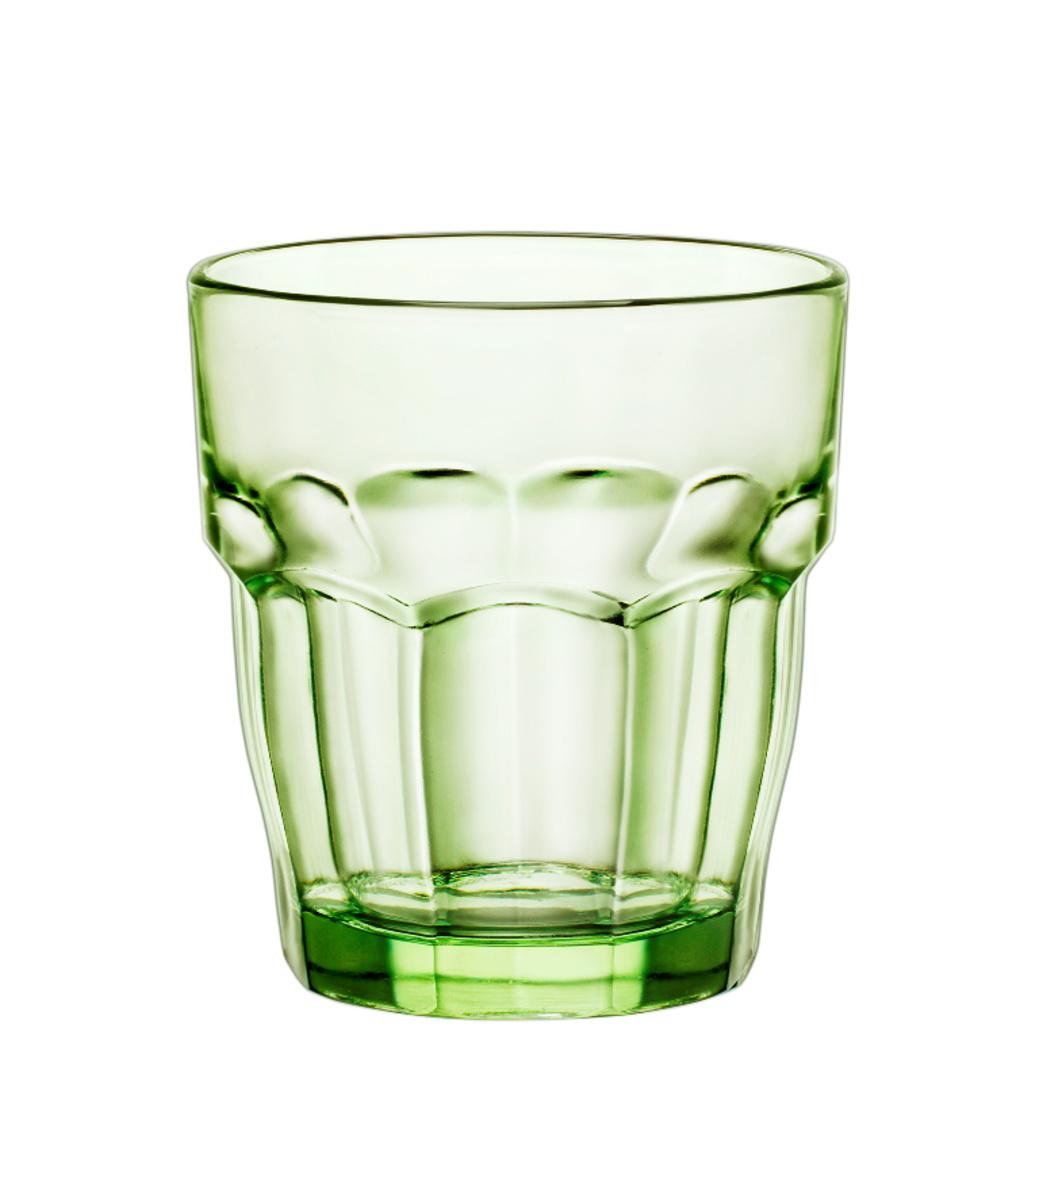 Gobelet forme basse vert 27 cl Rock Bar Bormioli Rocco